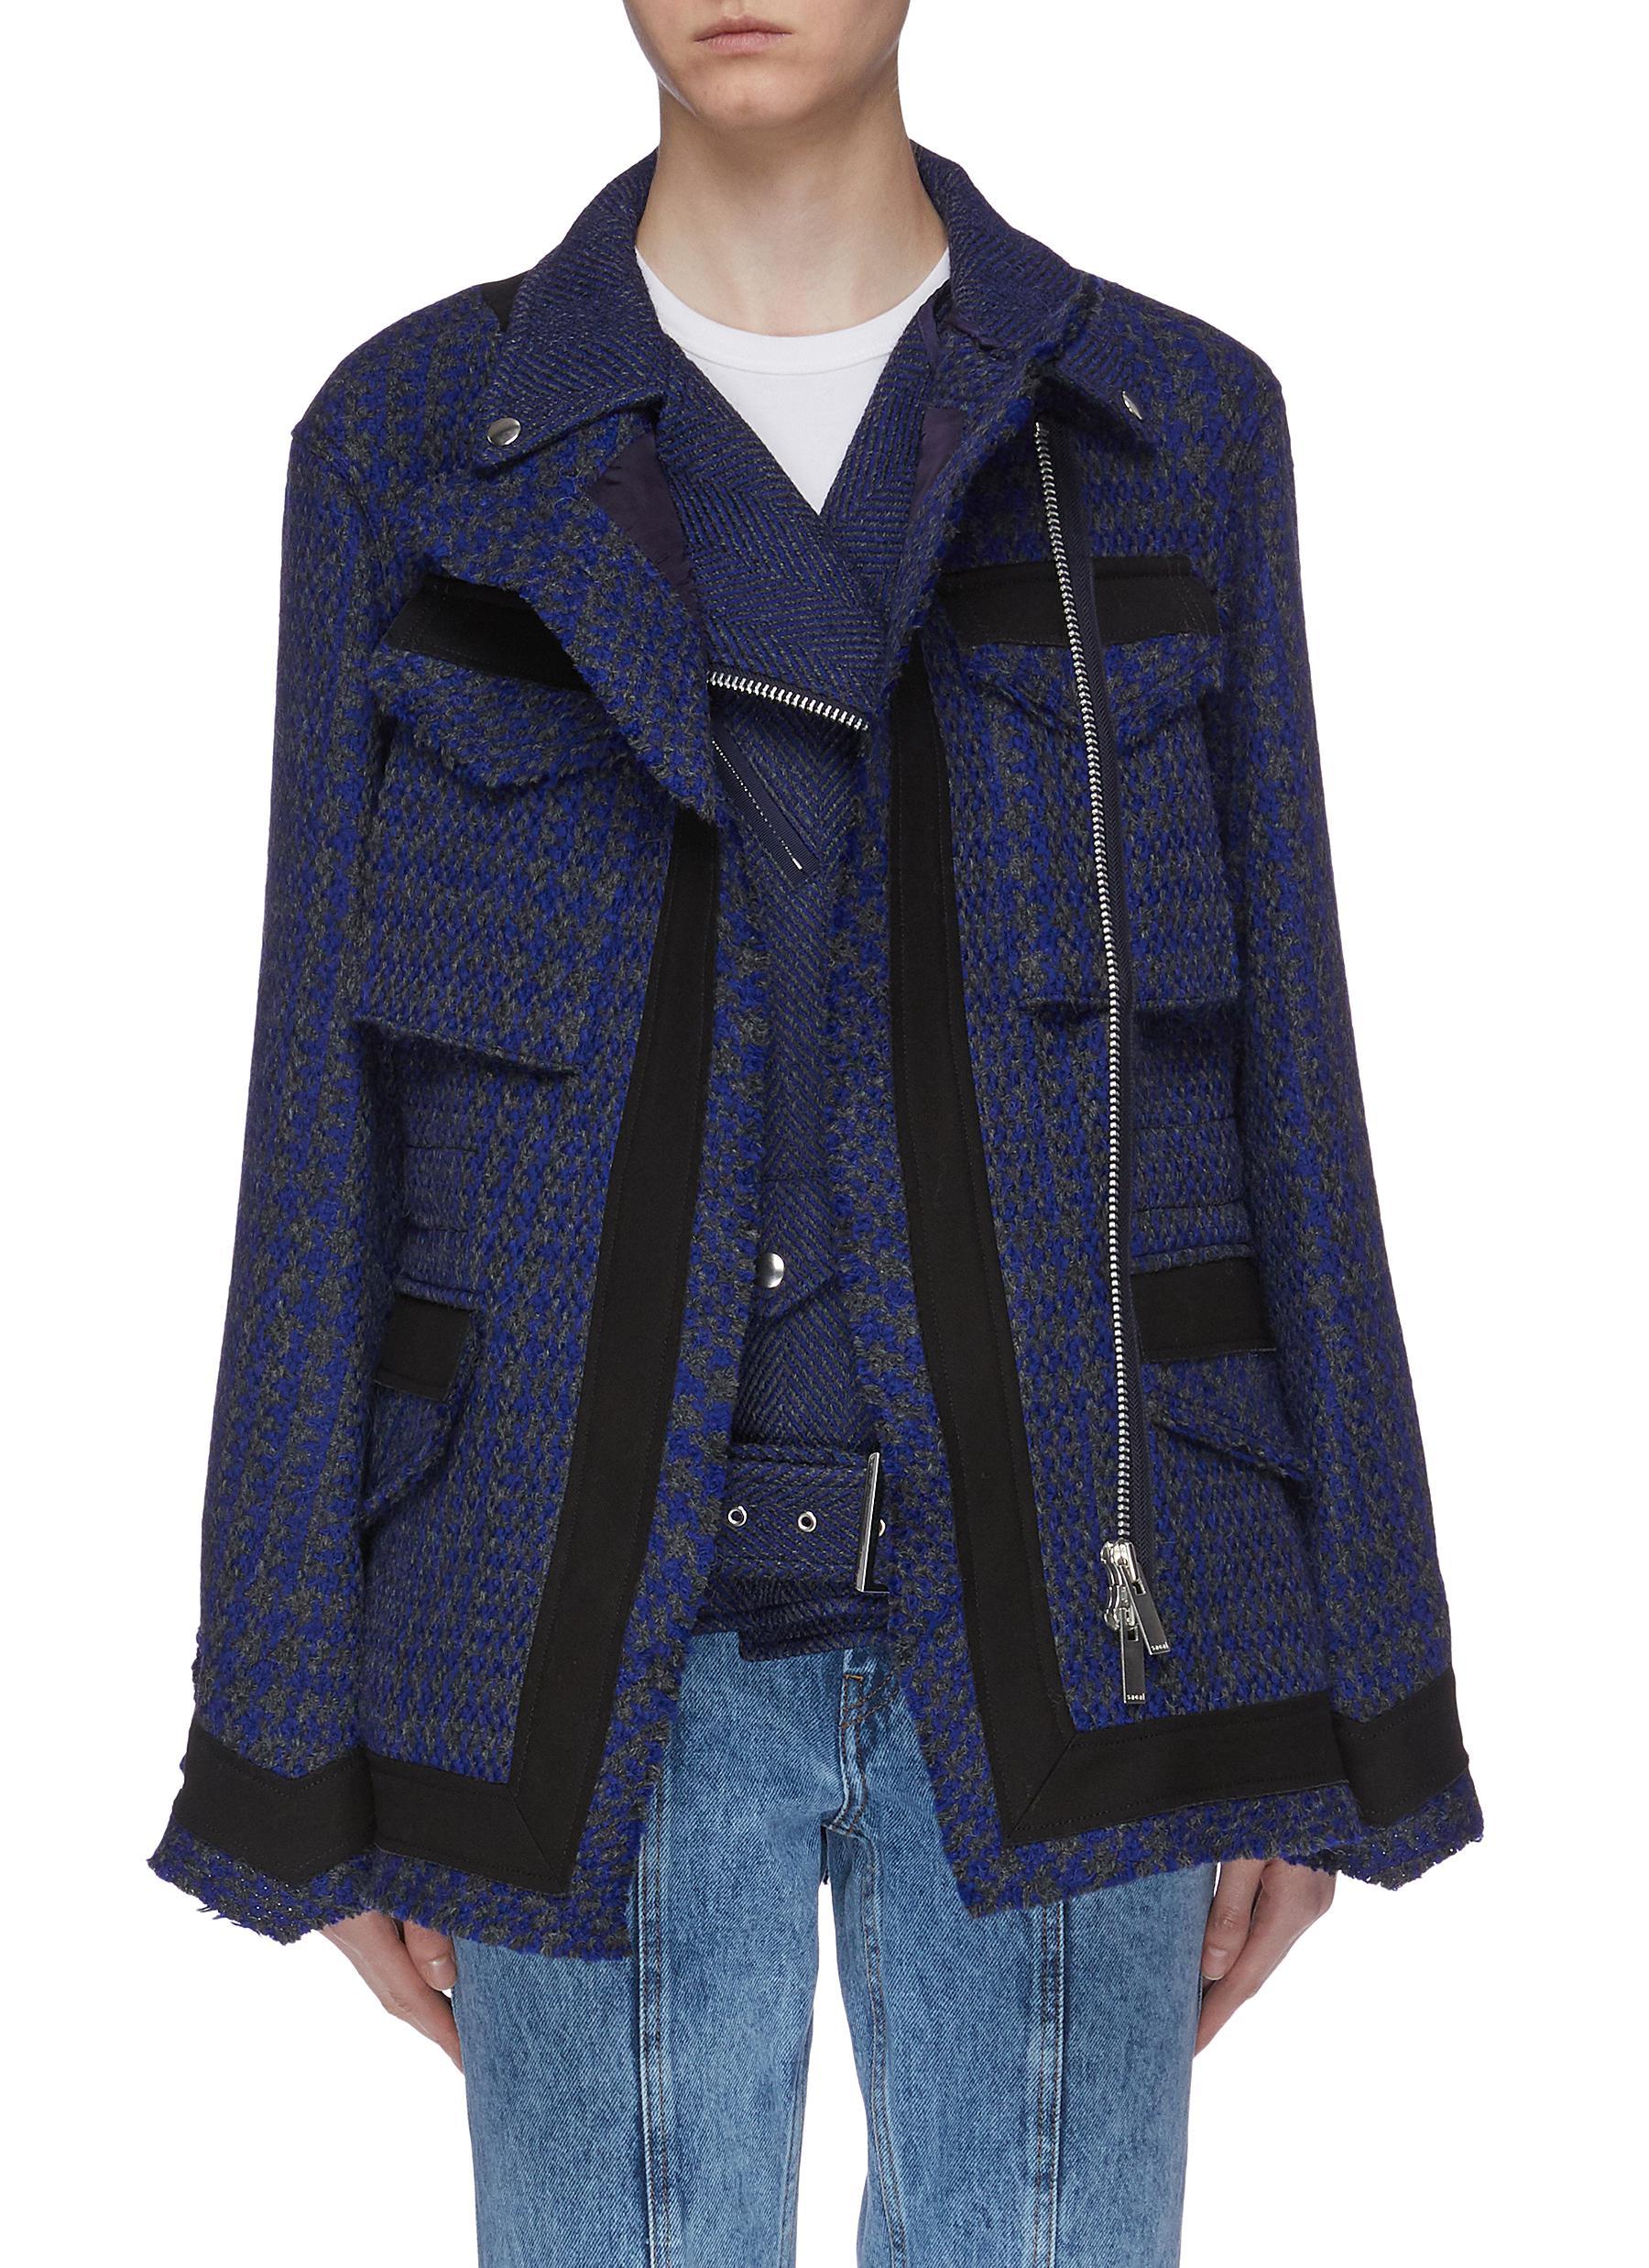 Layered flap pocket herringbone tweed biker jacket by Sacai